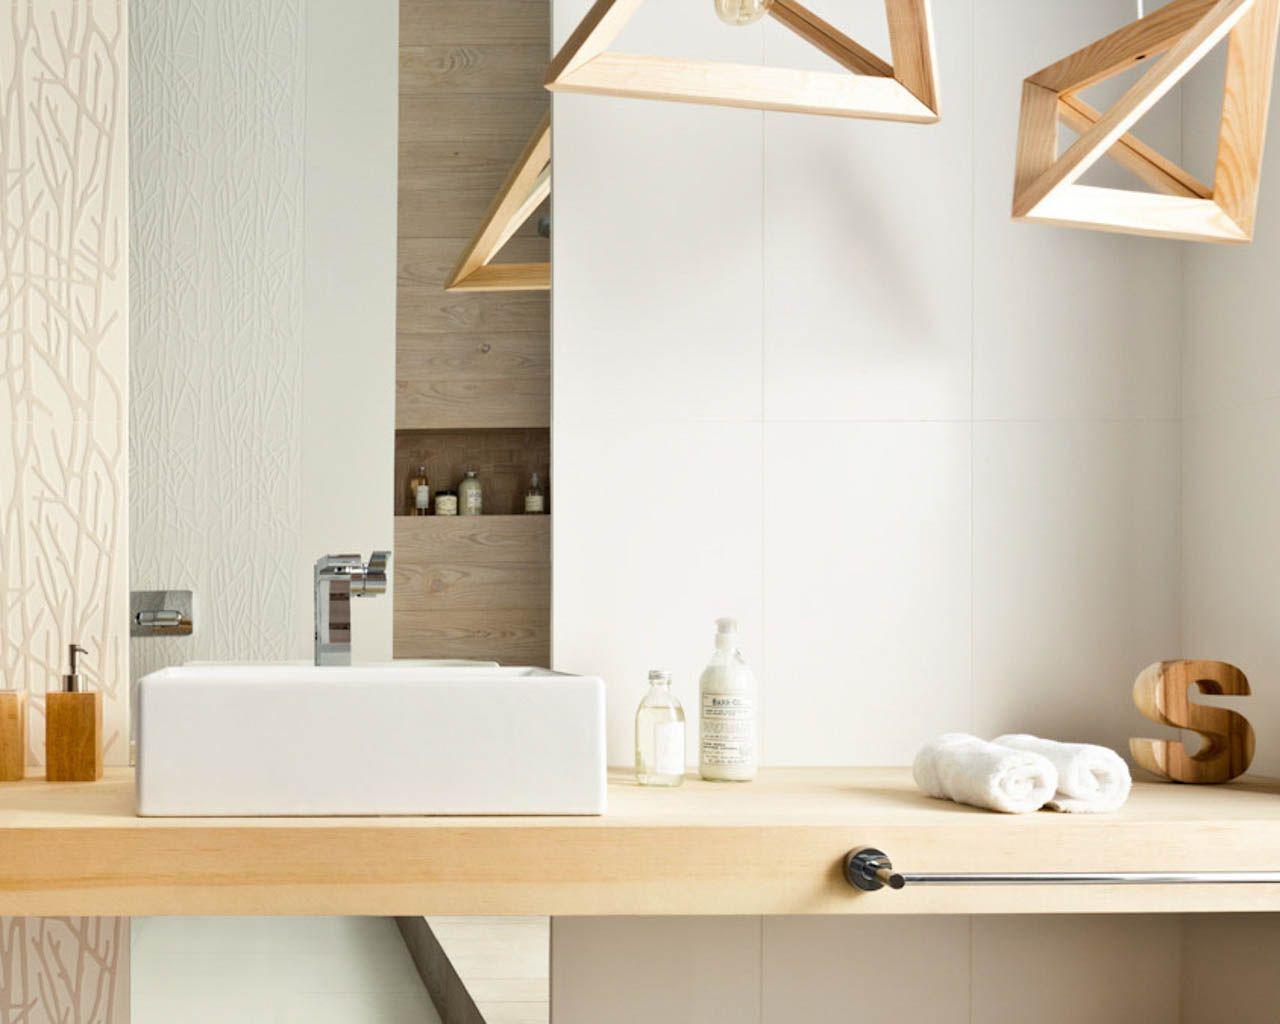 Bad im Hygge-Stil - Holz, Weiß und Pflanzenmotive   Ceramika Paradyz